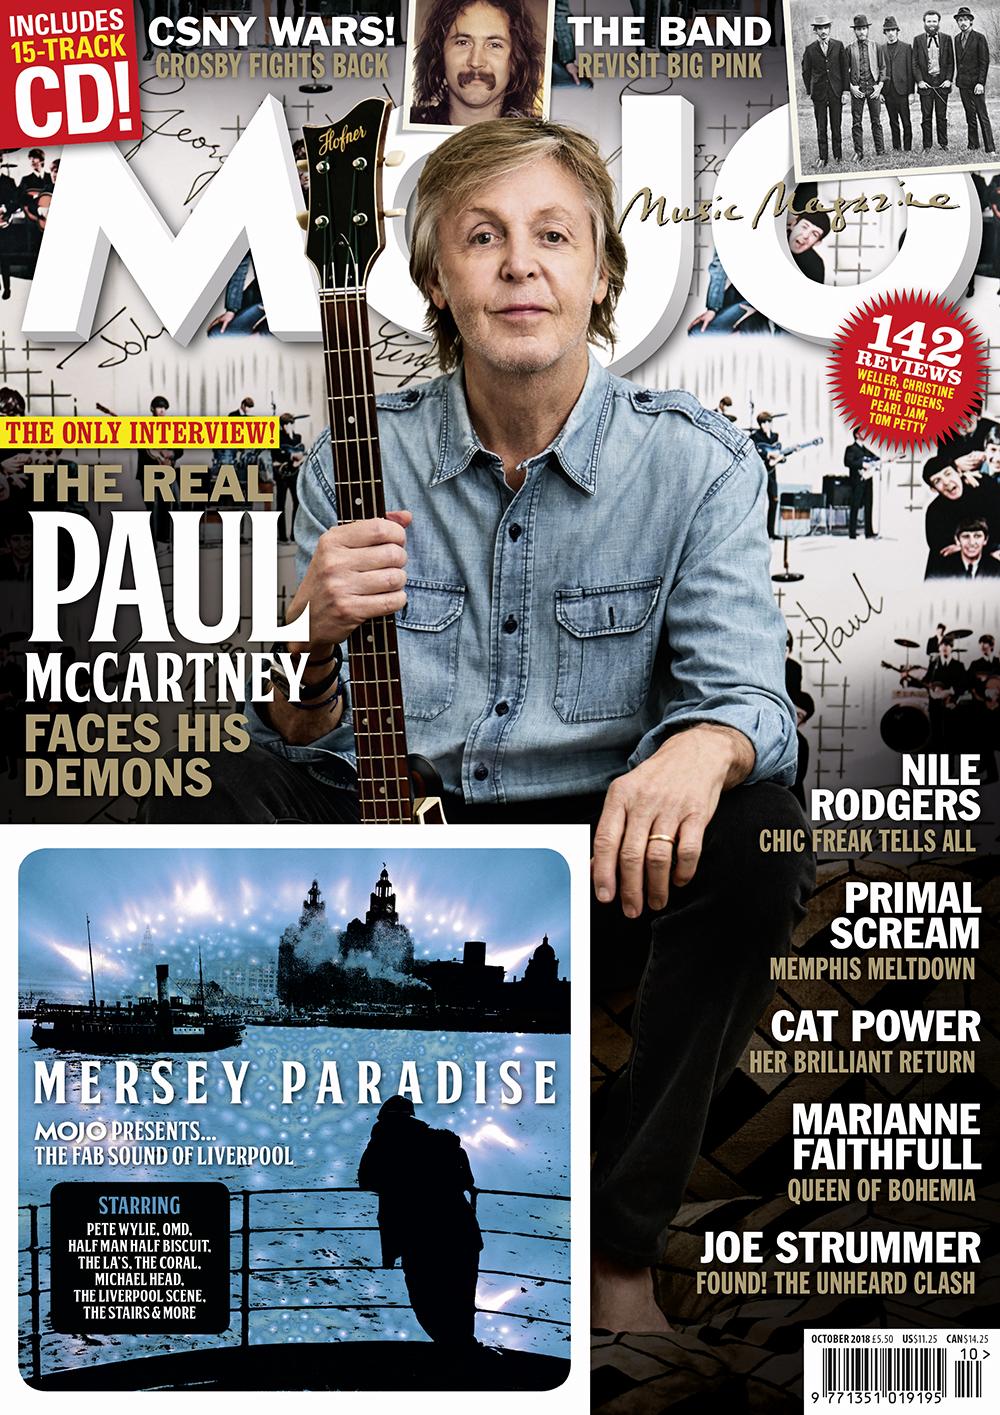 MOJO299_McCartney_CD_1000.jpg